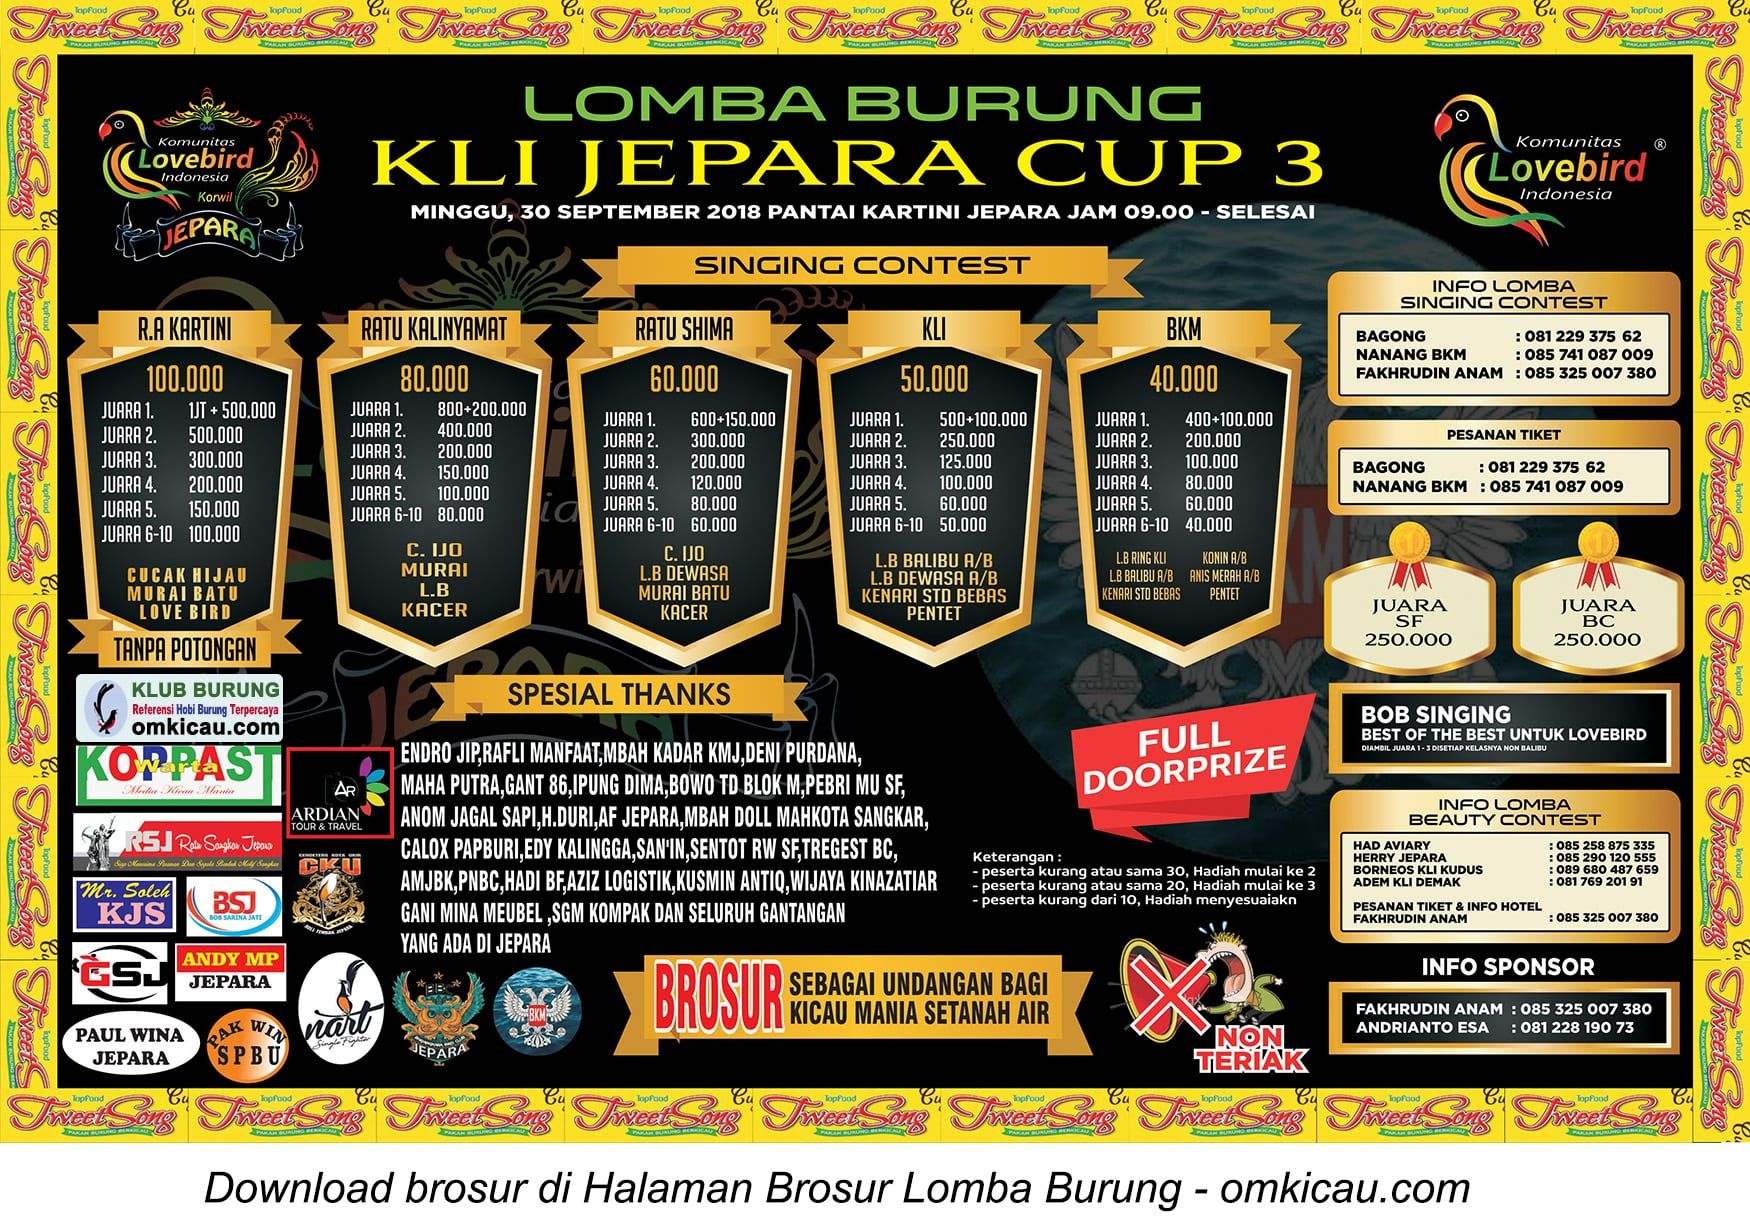 KLI Jepara Cup 3